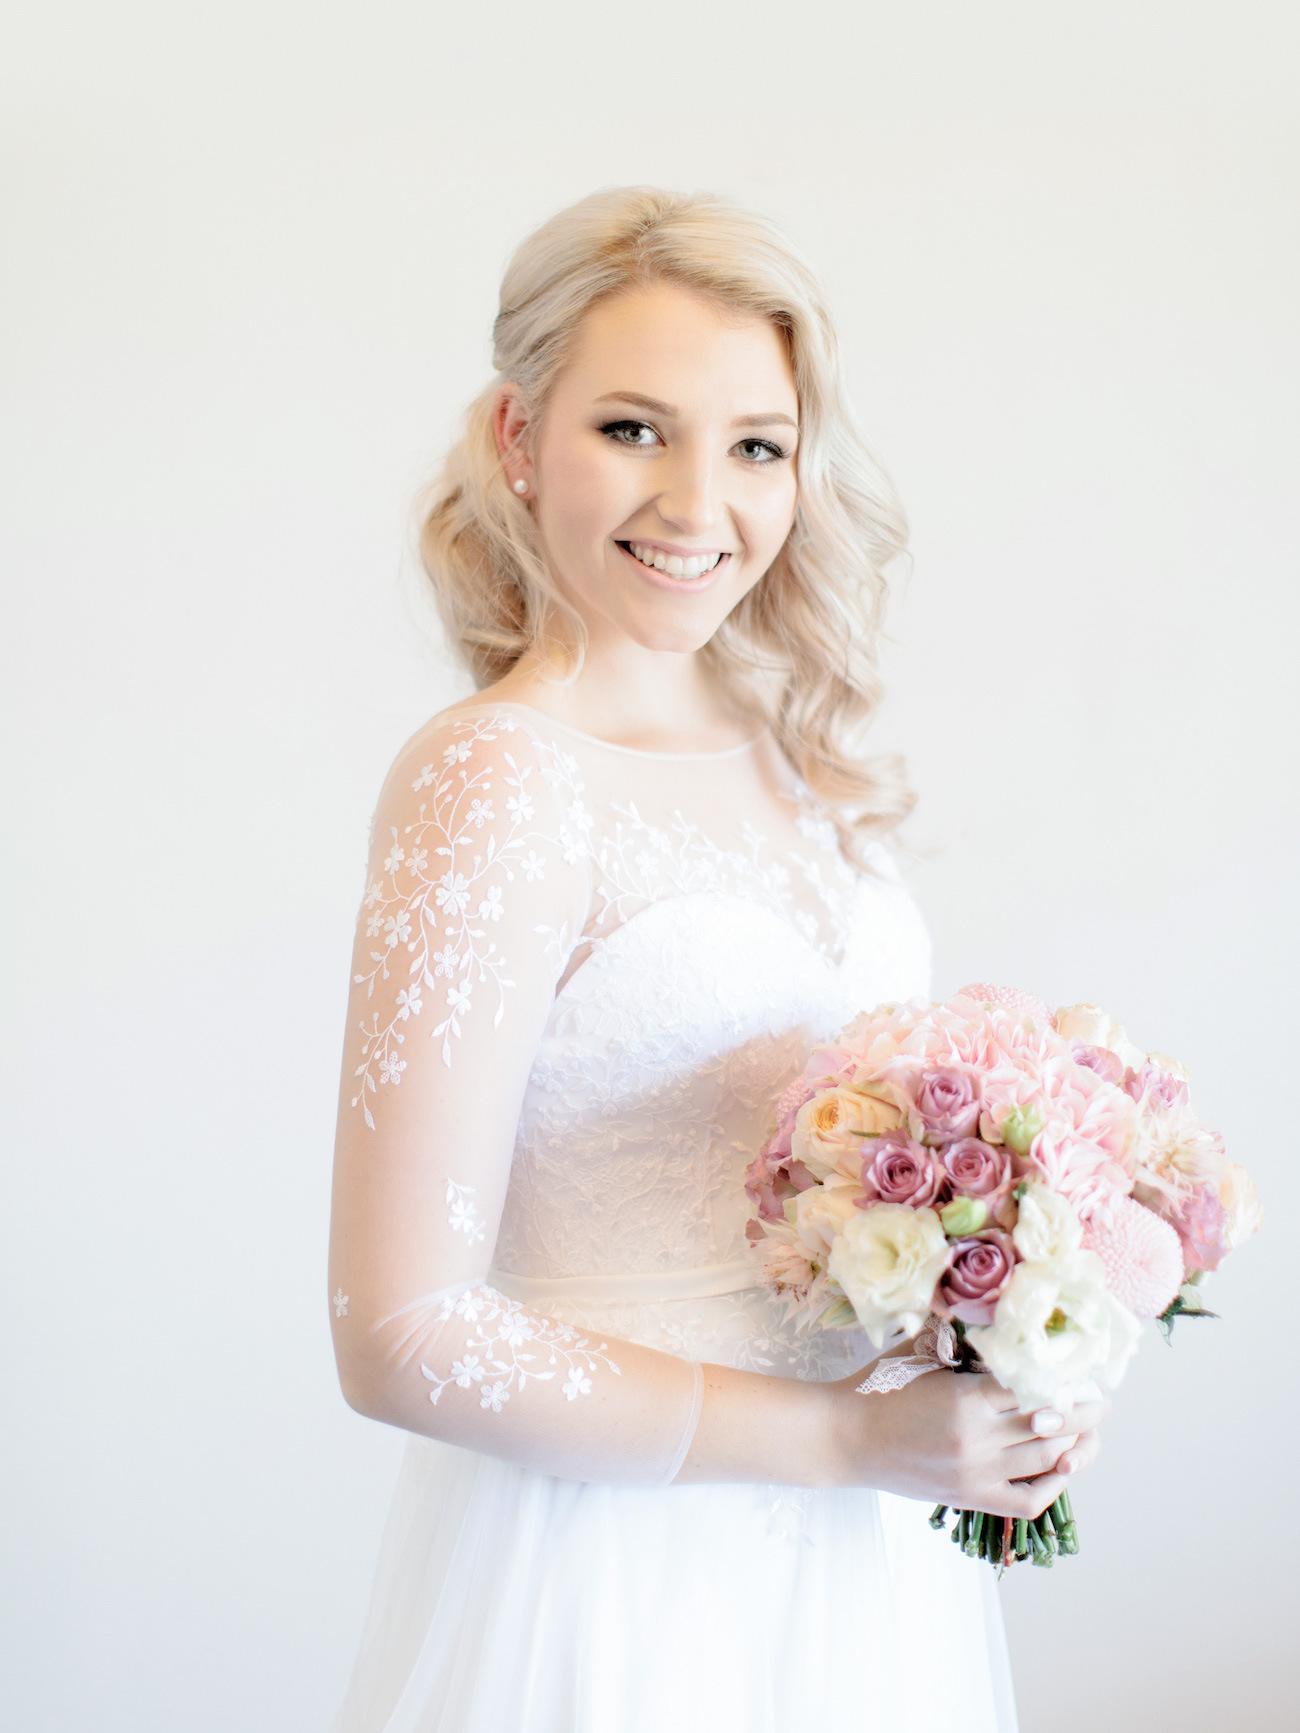 Illusion Floral Detail Wedding Dress | Image: Rensche Mari